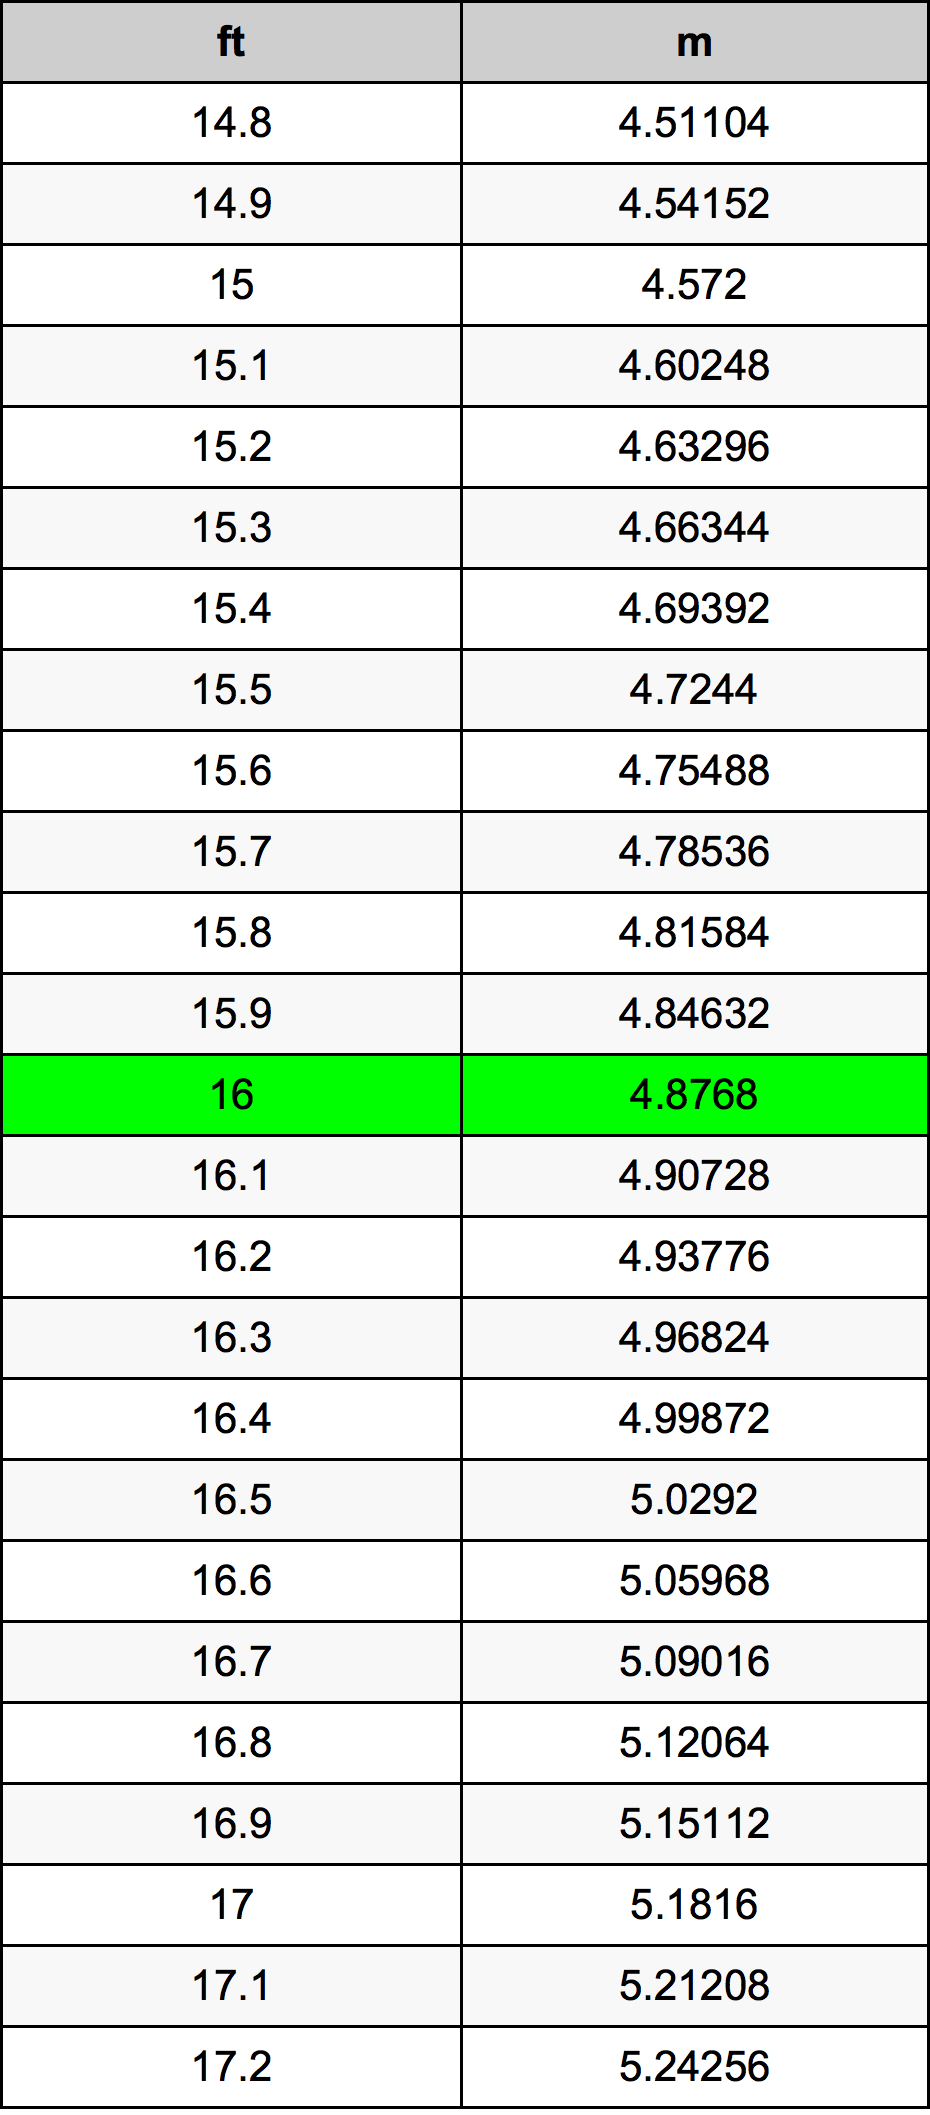 16 Feet To Metres Converter 16 Ft To M Converter